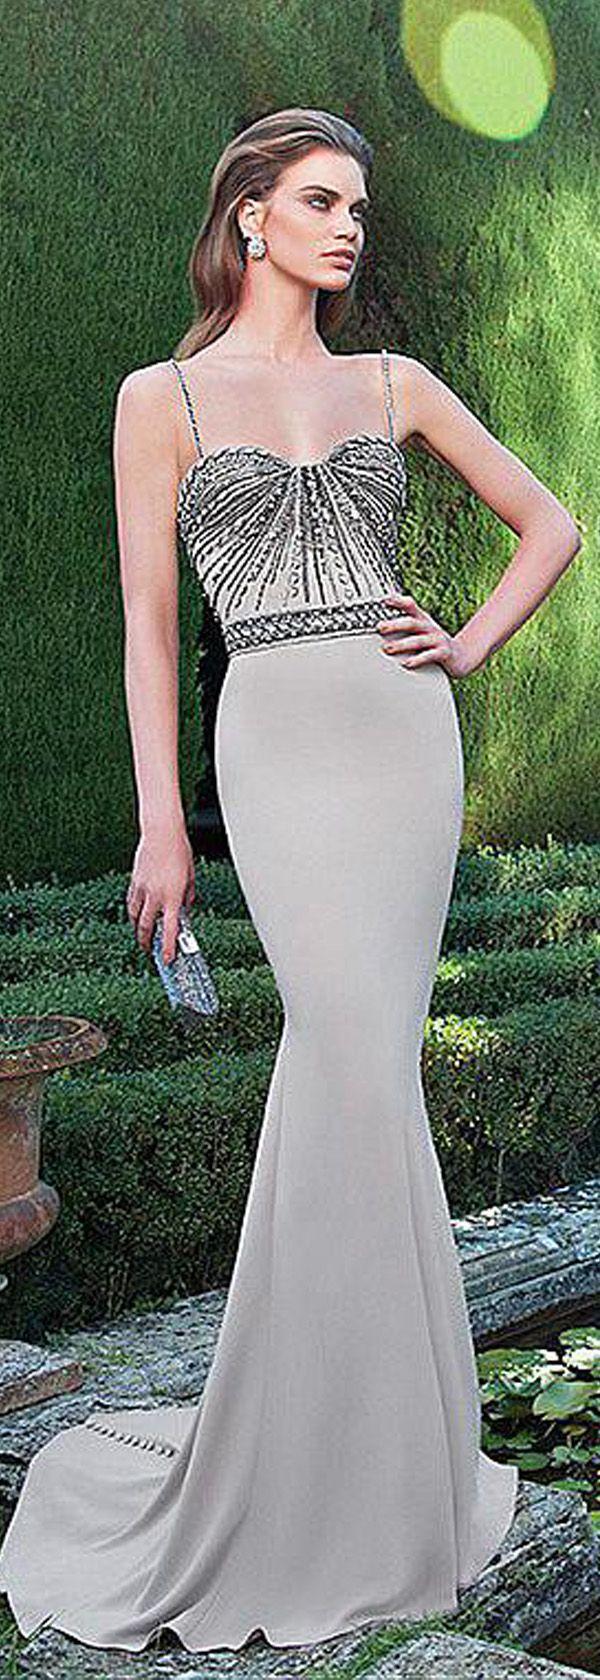 Glamorous Stretch Satin Spaghetti Straps Neckline Mermaid Formal Dresses